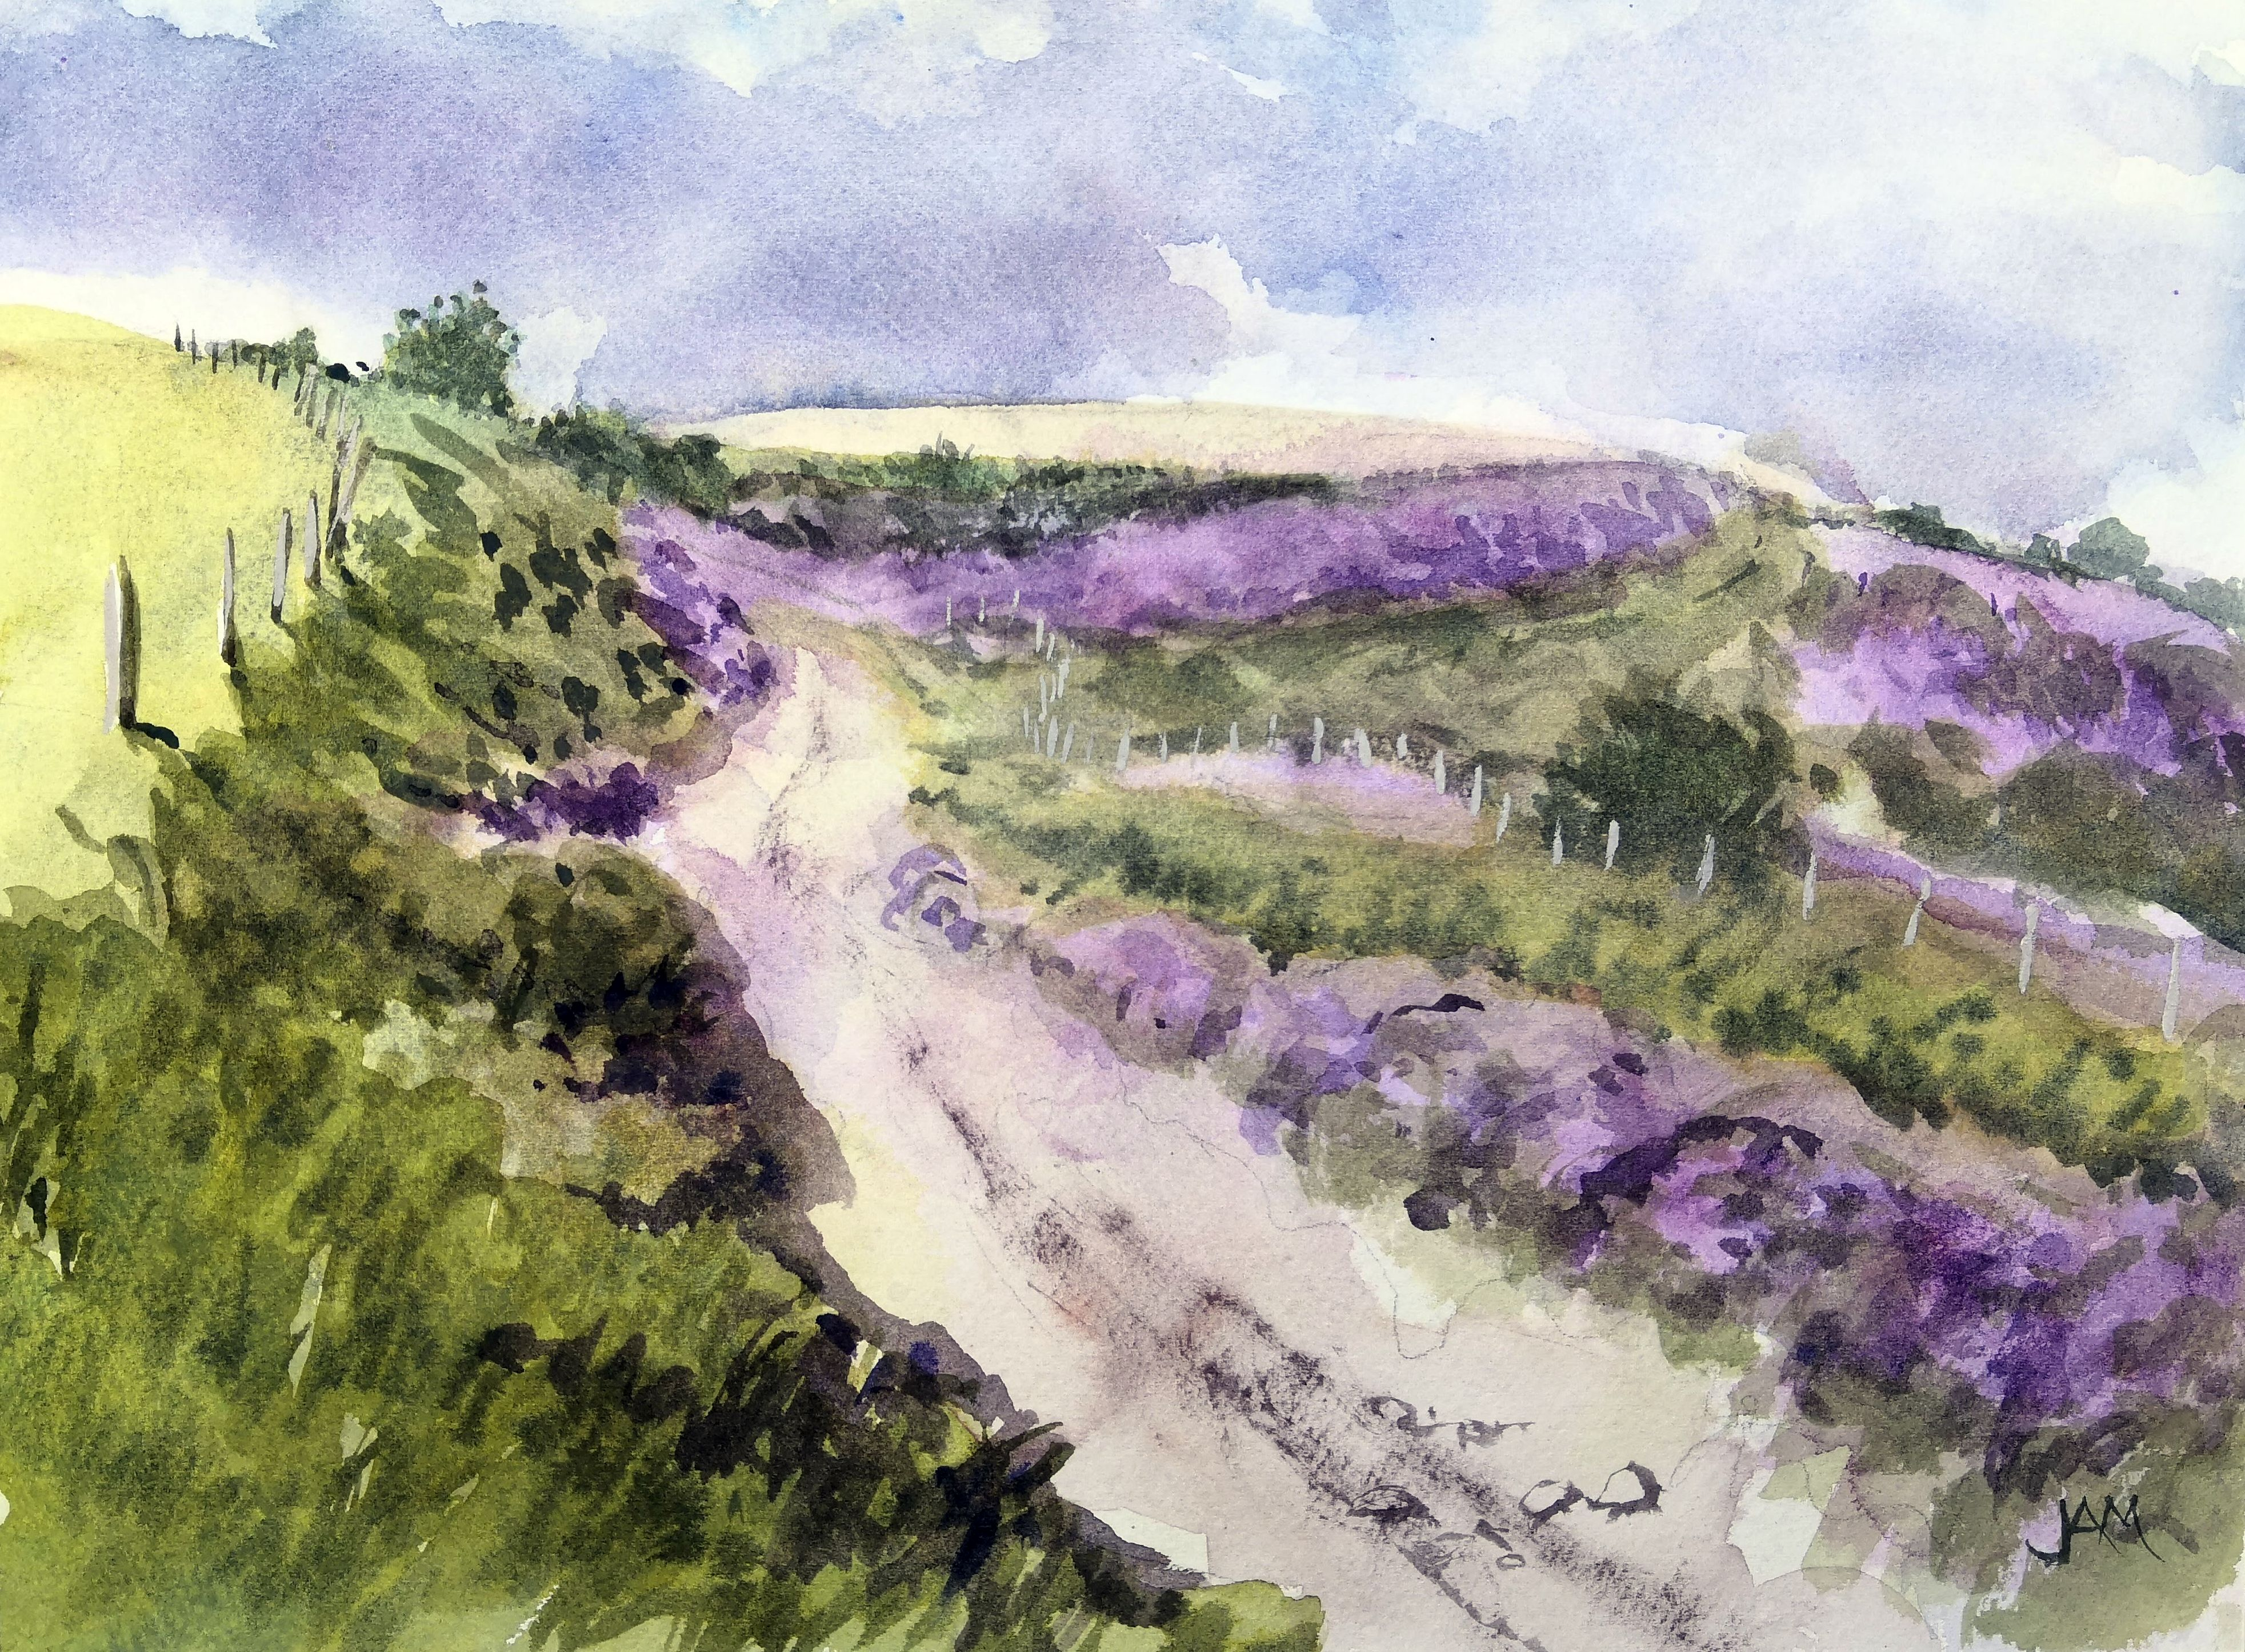 Heathered Hills